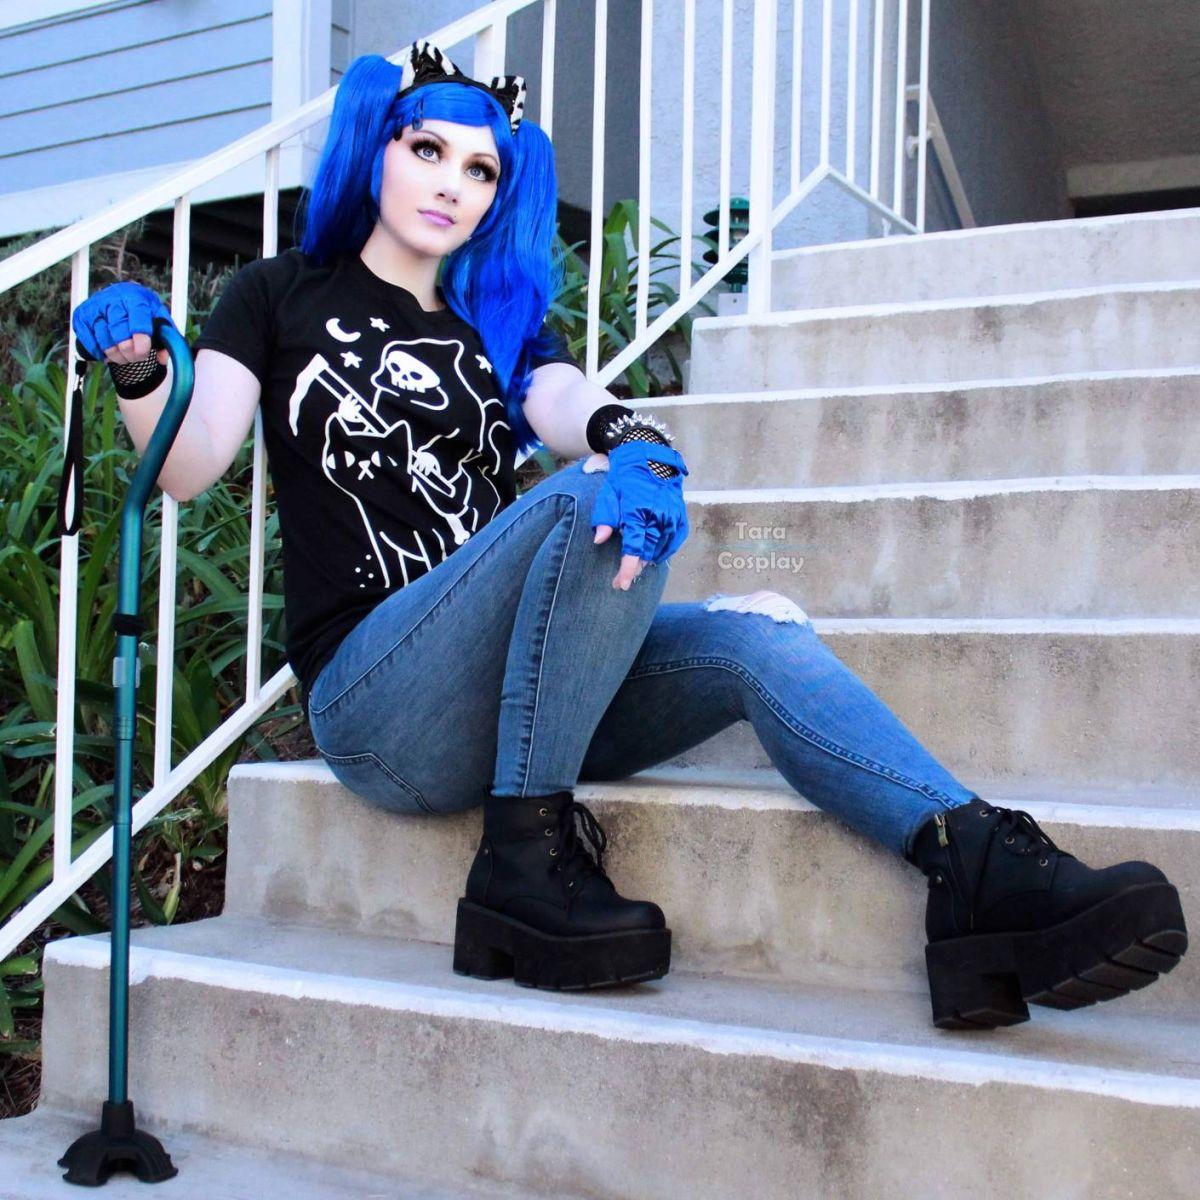 cosplay photography fanatic by taracosplay